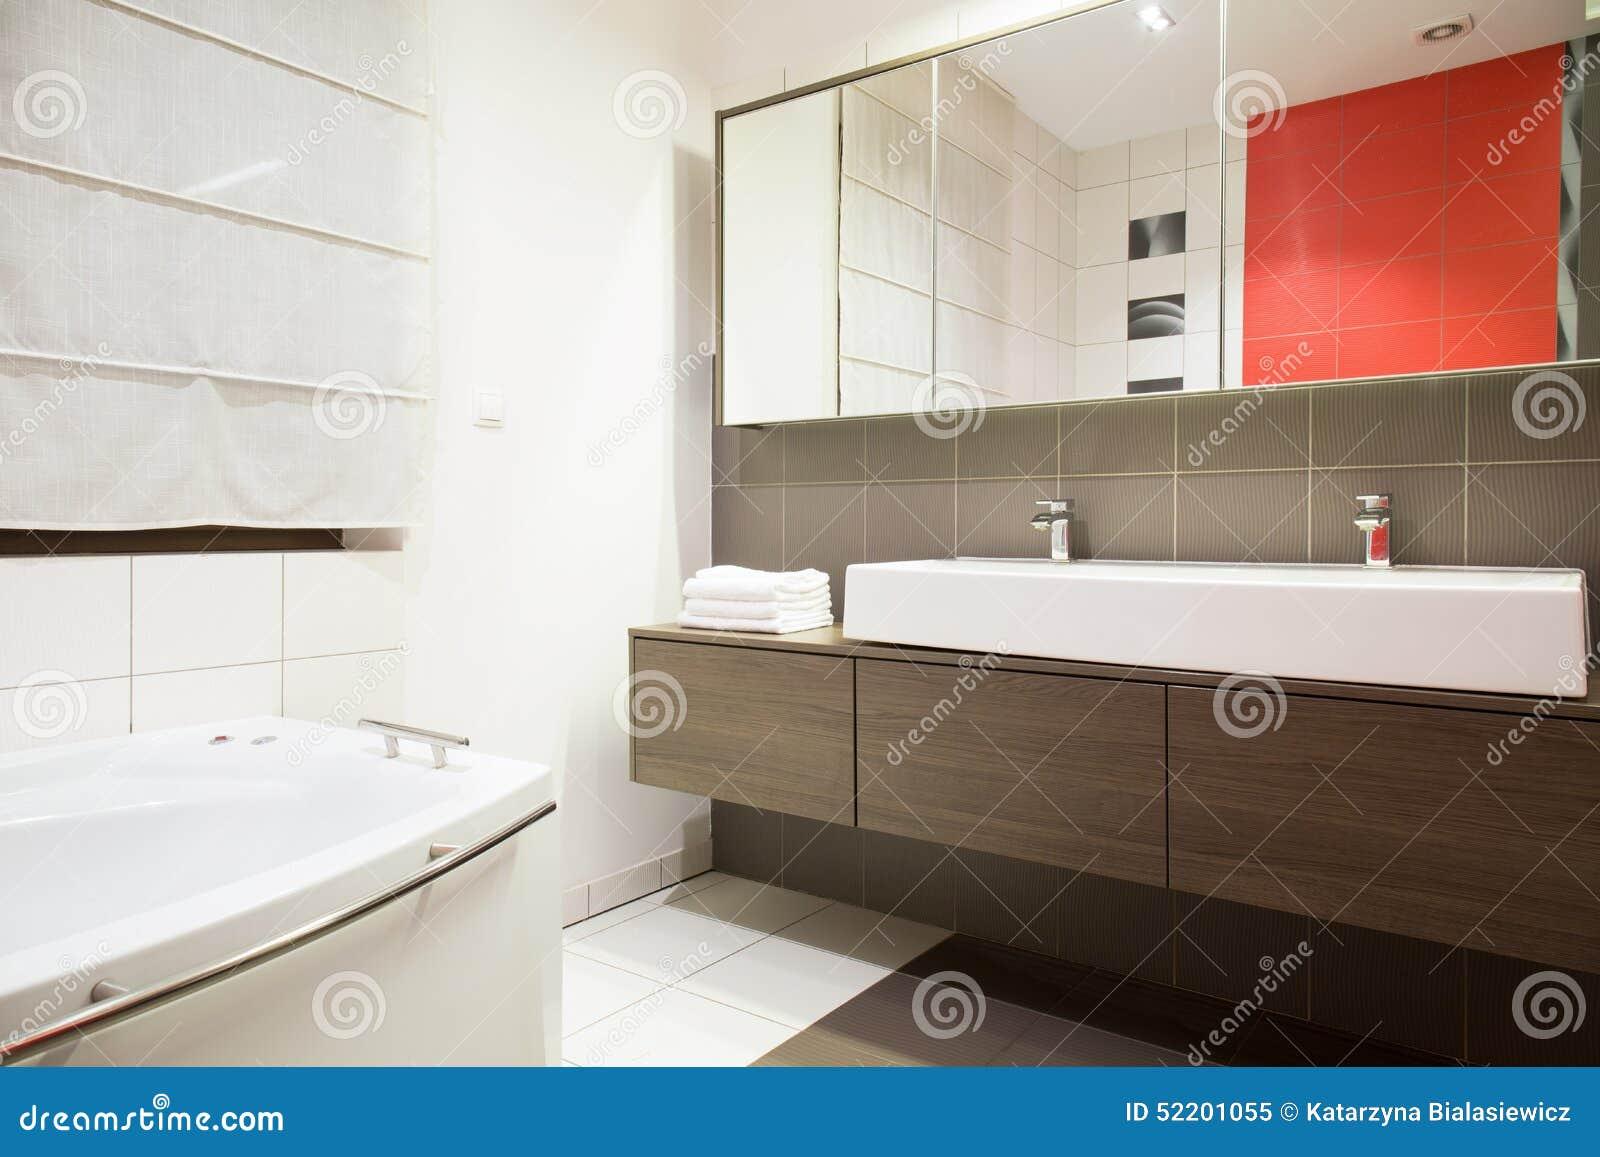 Exklusives Badezimmer stockbild. Bild von haupt, marmor - 52201055